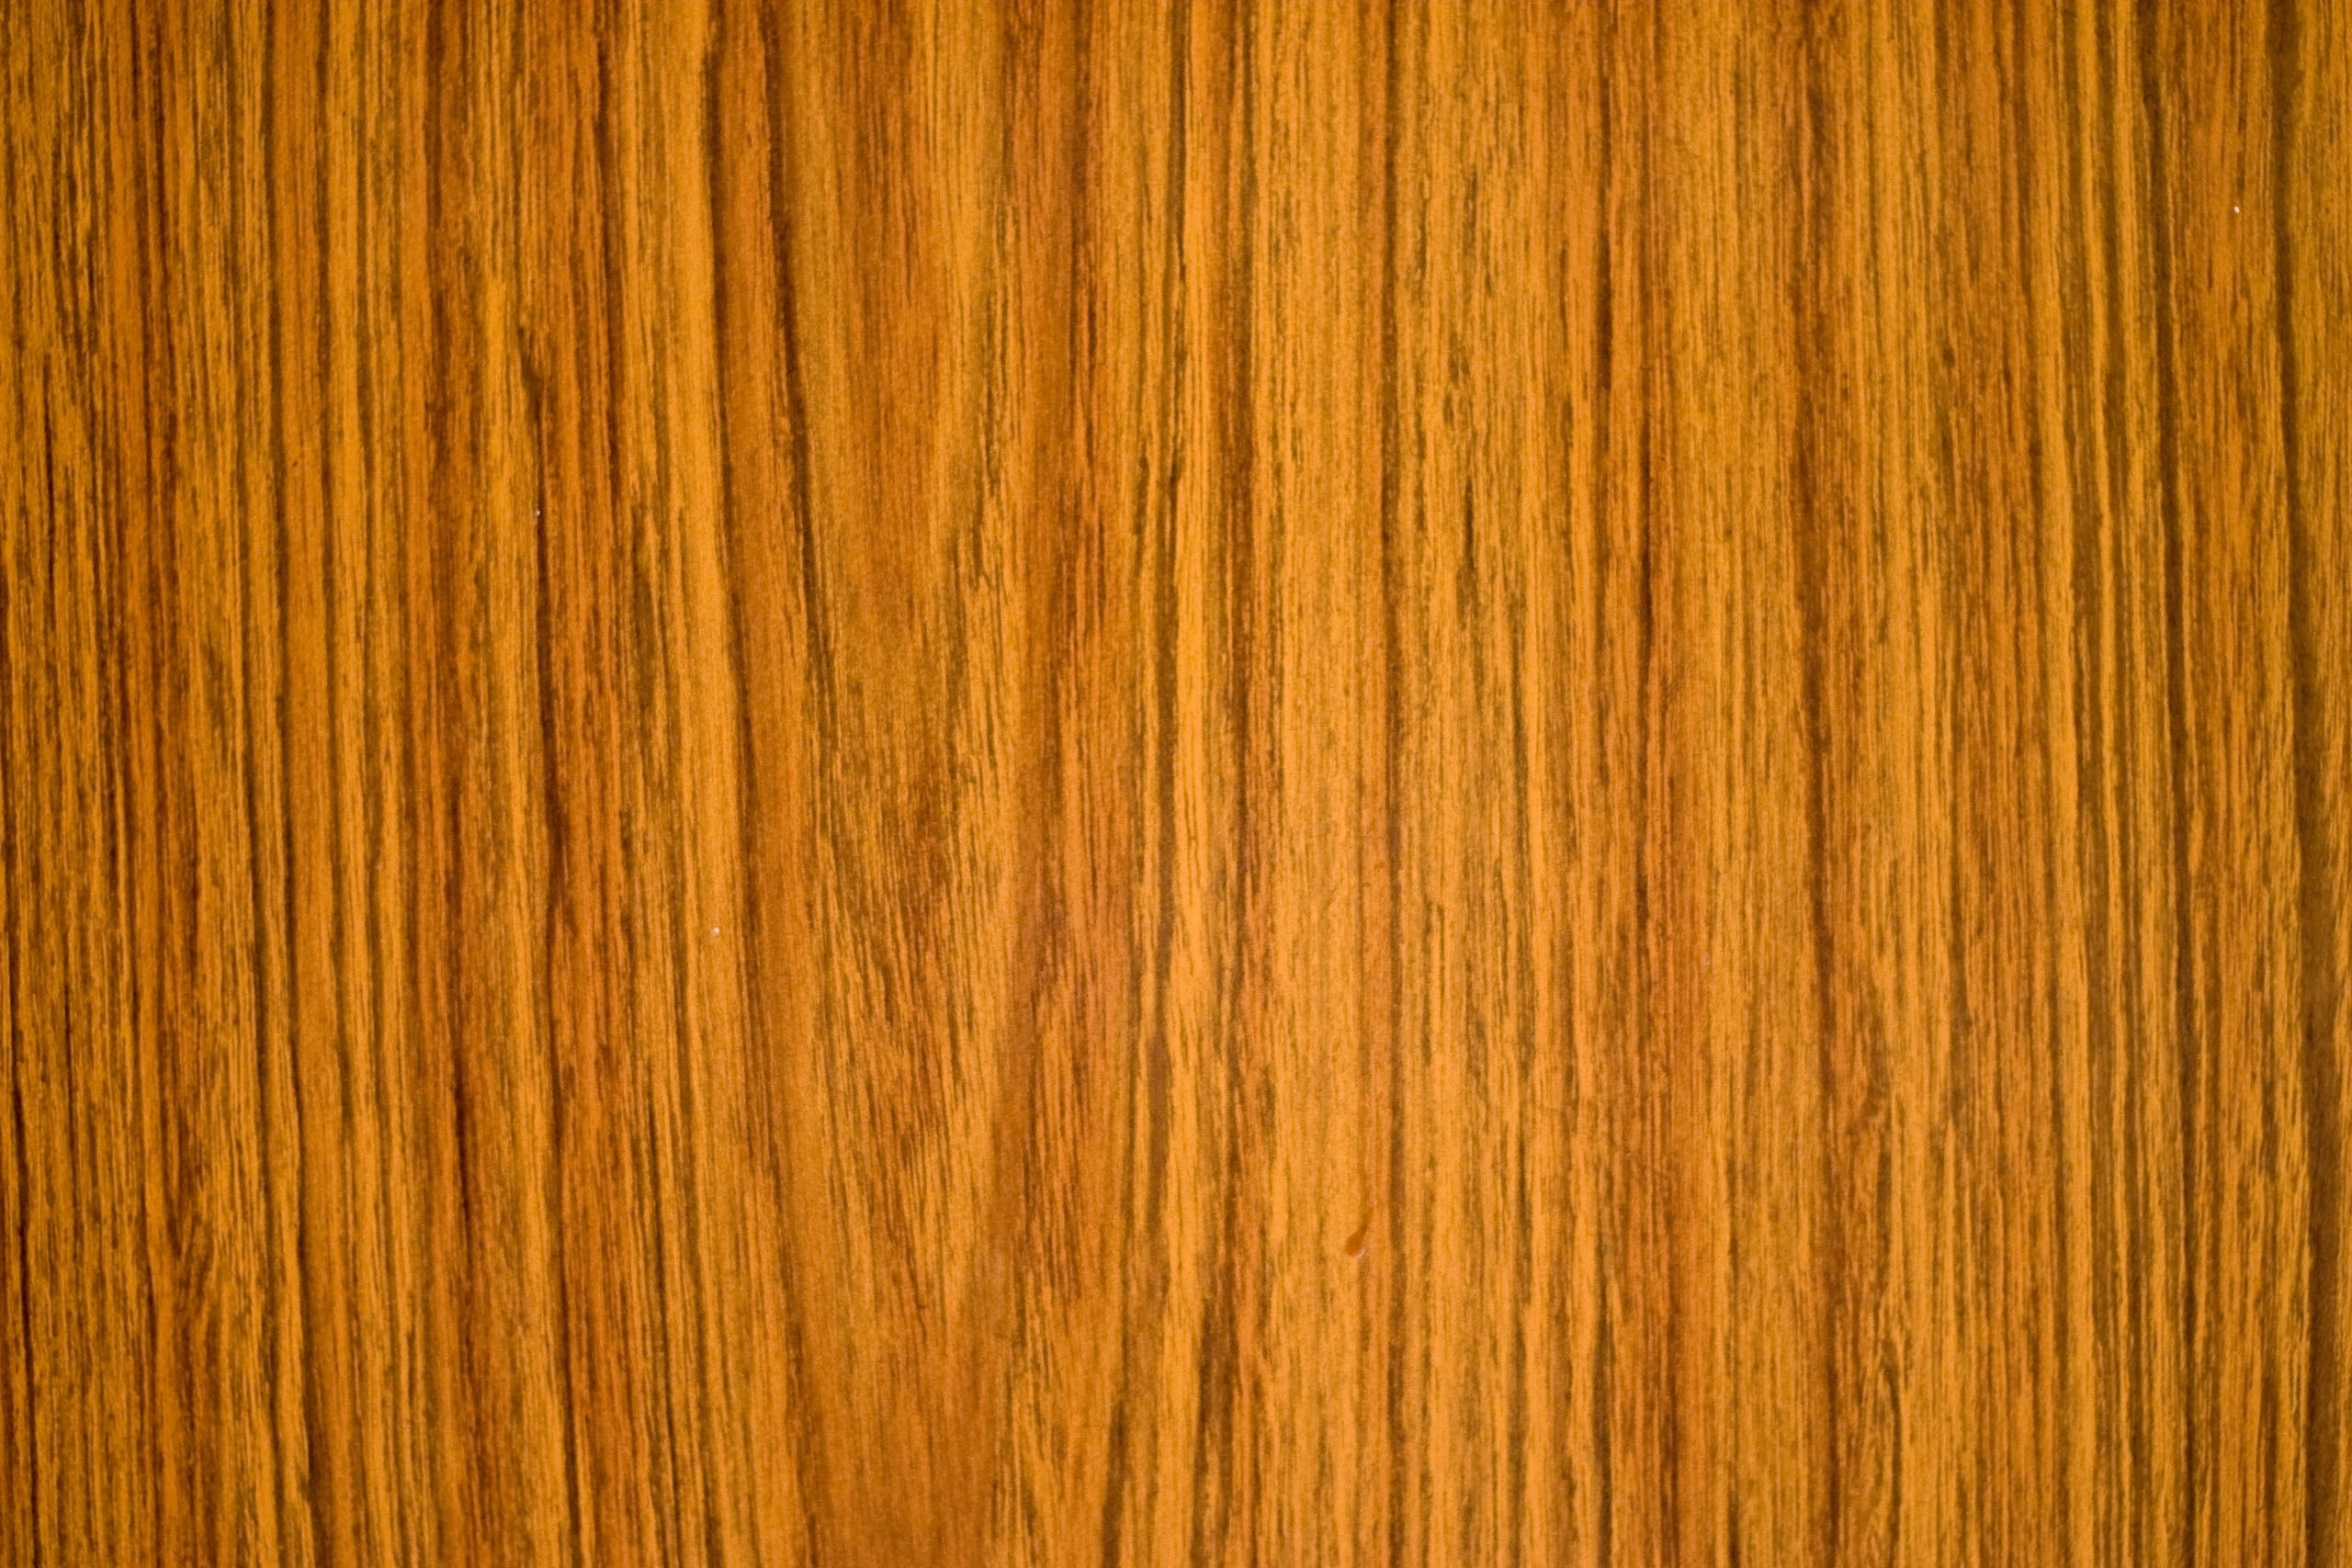 wood grain hd wallpaper | ololoshenka | pinterest | wood grain and